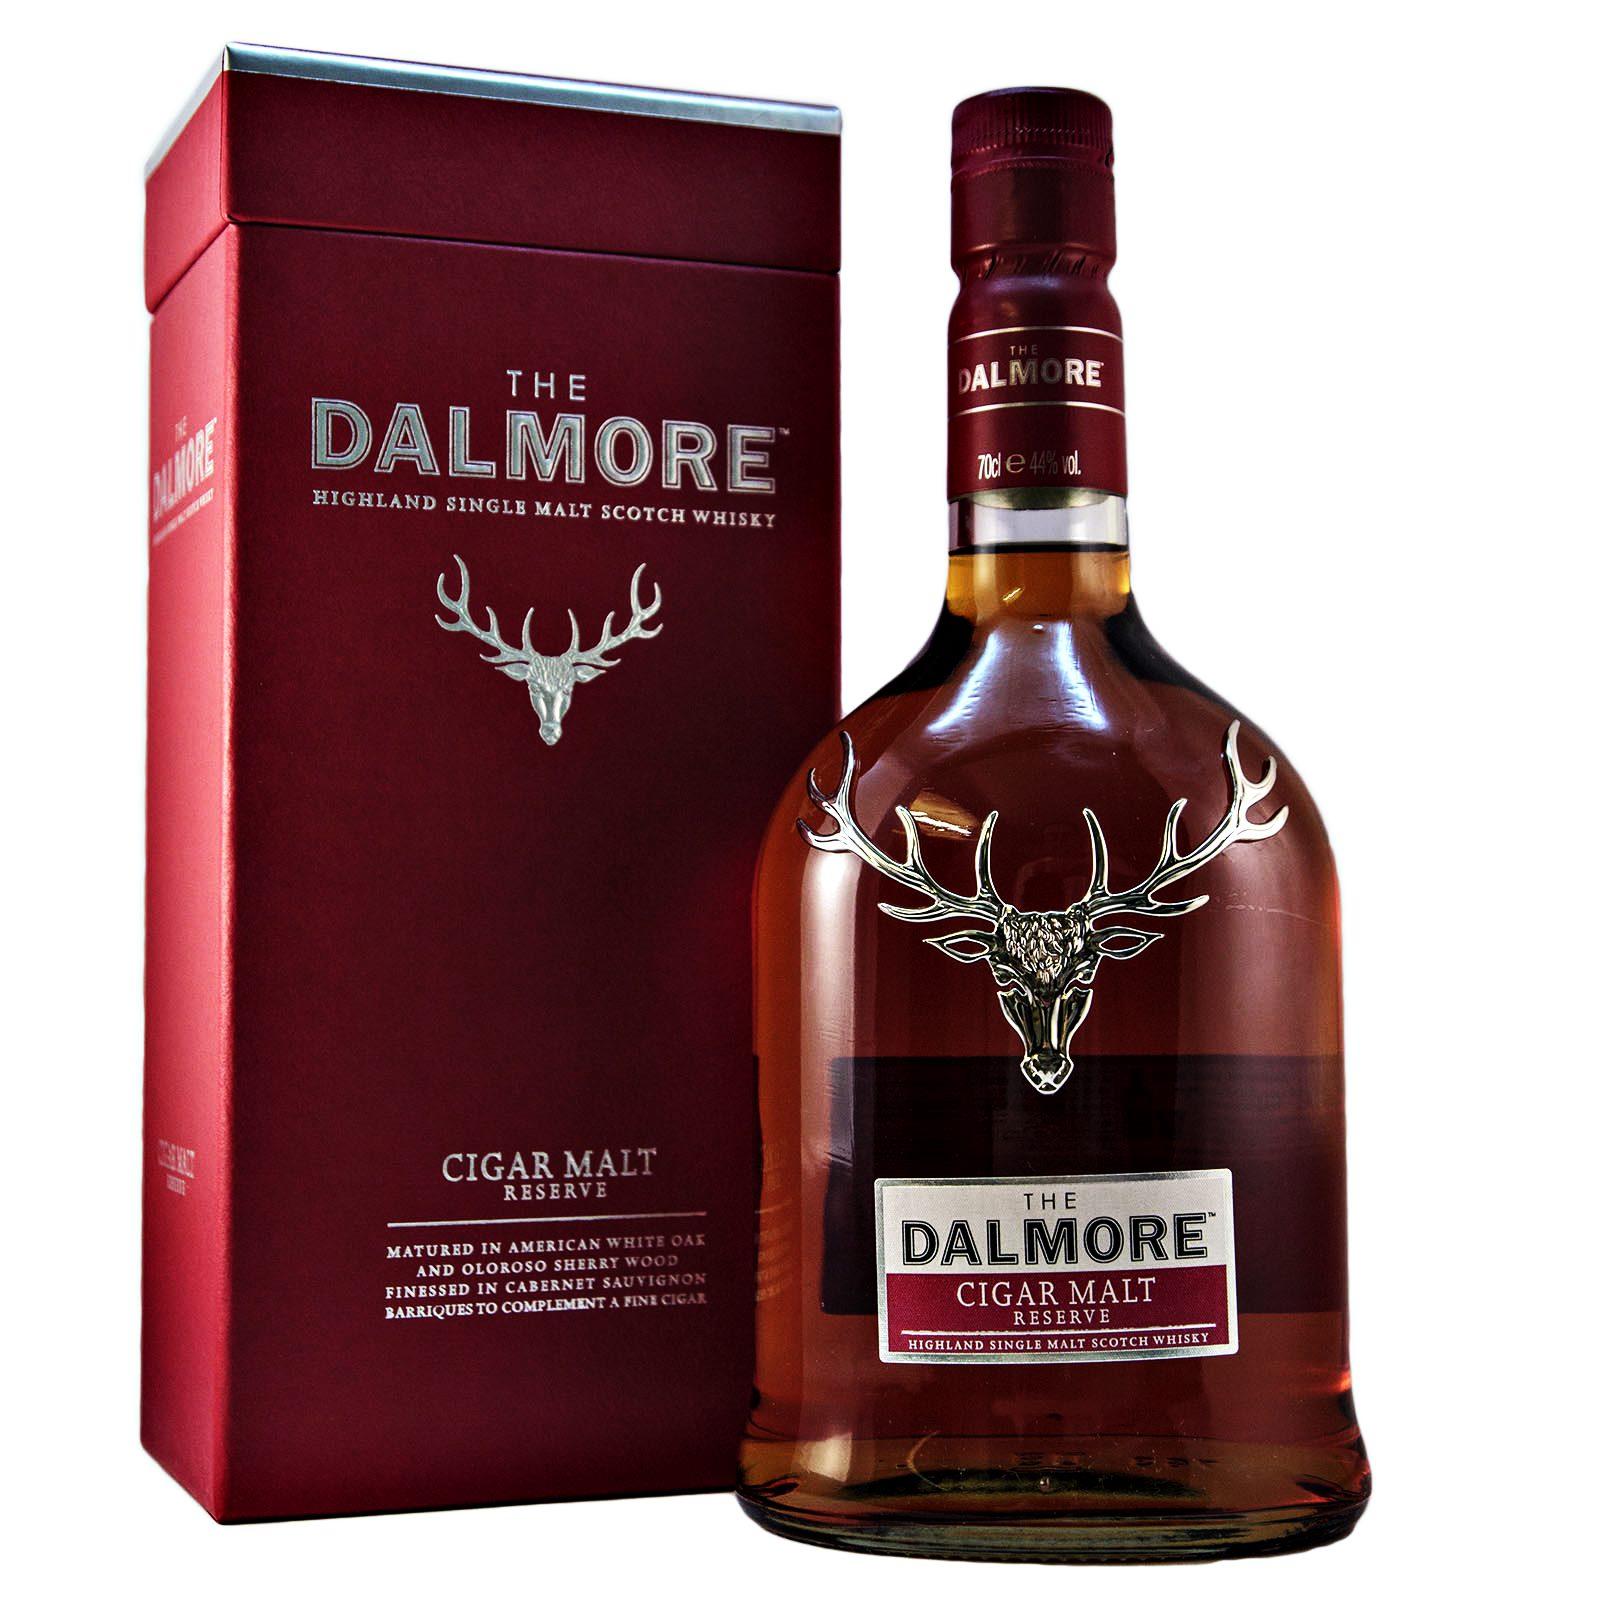 Dalmore Cigar Malt Reserve Whisky Buy Online Whiskys Co Uk